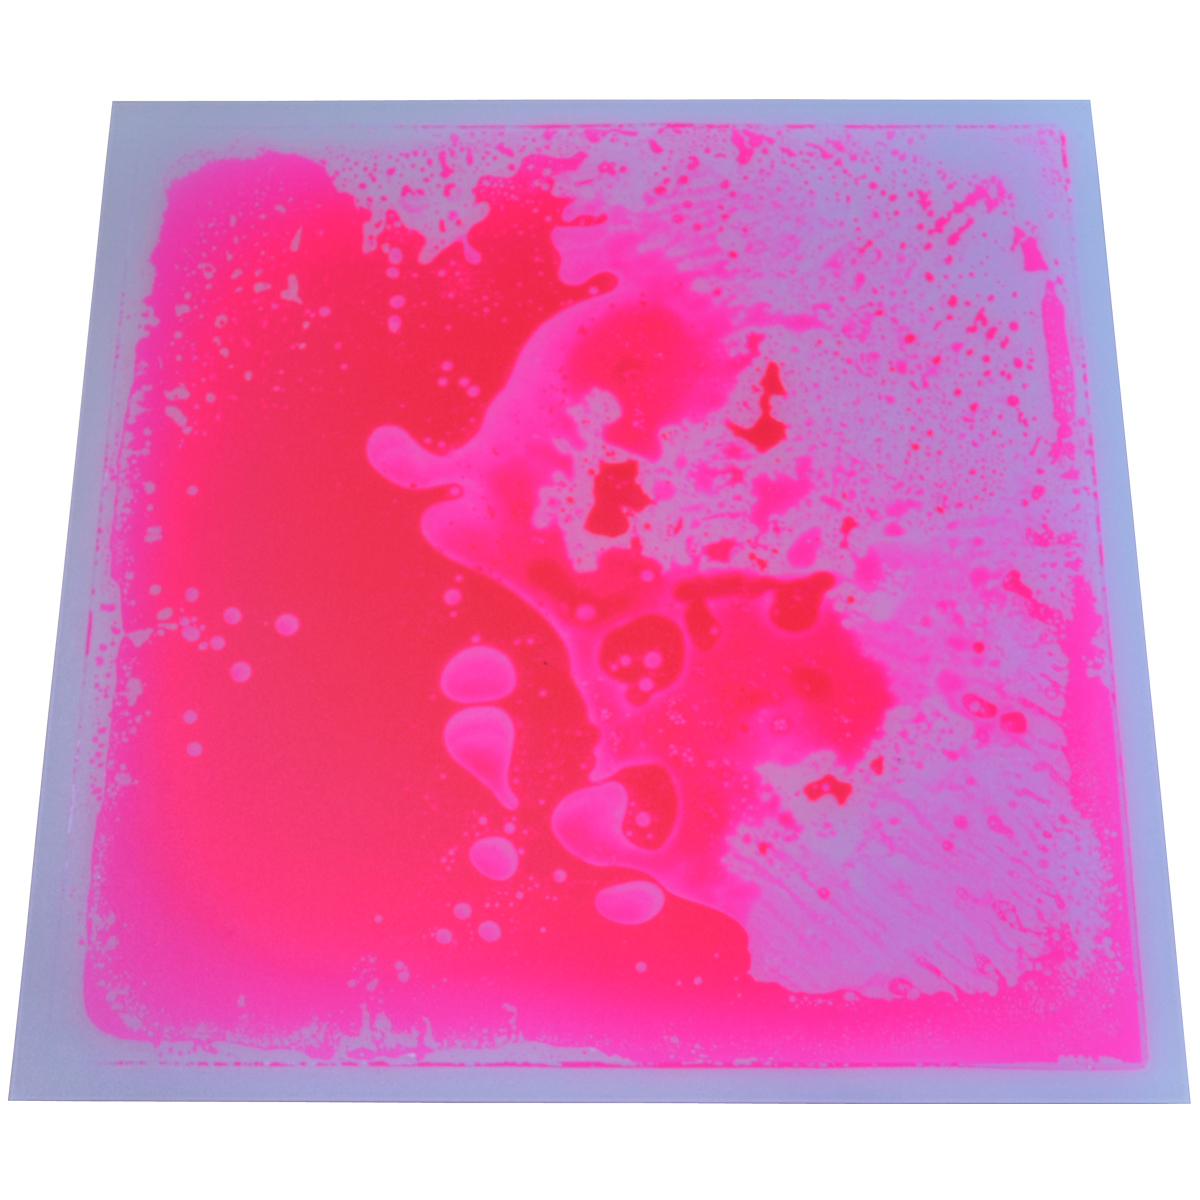 12x12 pink liquid floor tile home decor tiles for bar a11302 12x12 pink liquid floor tile home decor tiles for bar nightclub ktv decoration dailygadgetfo Gallery